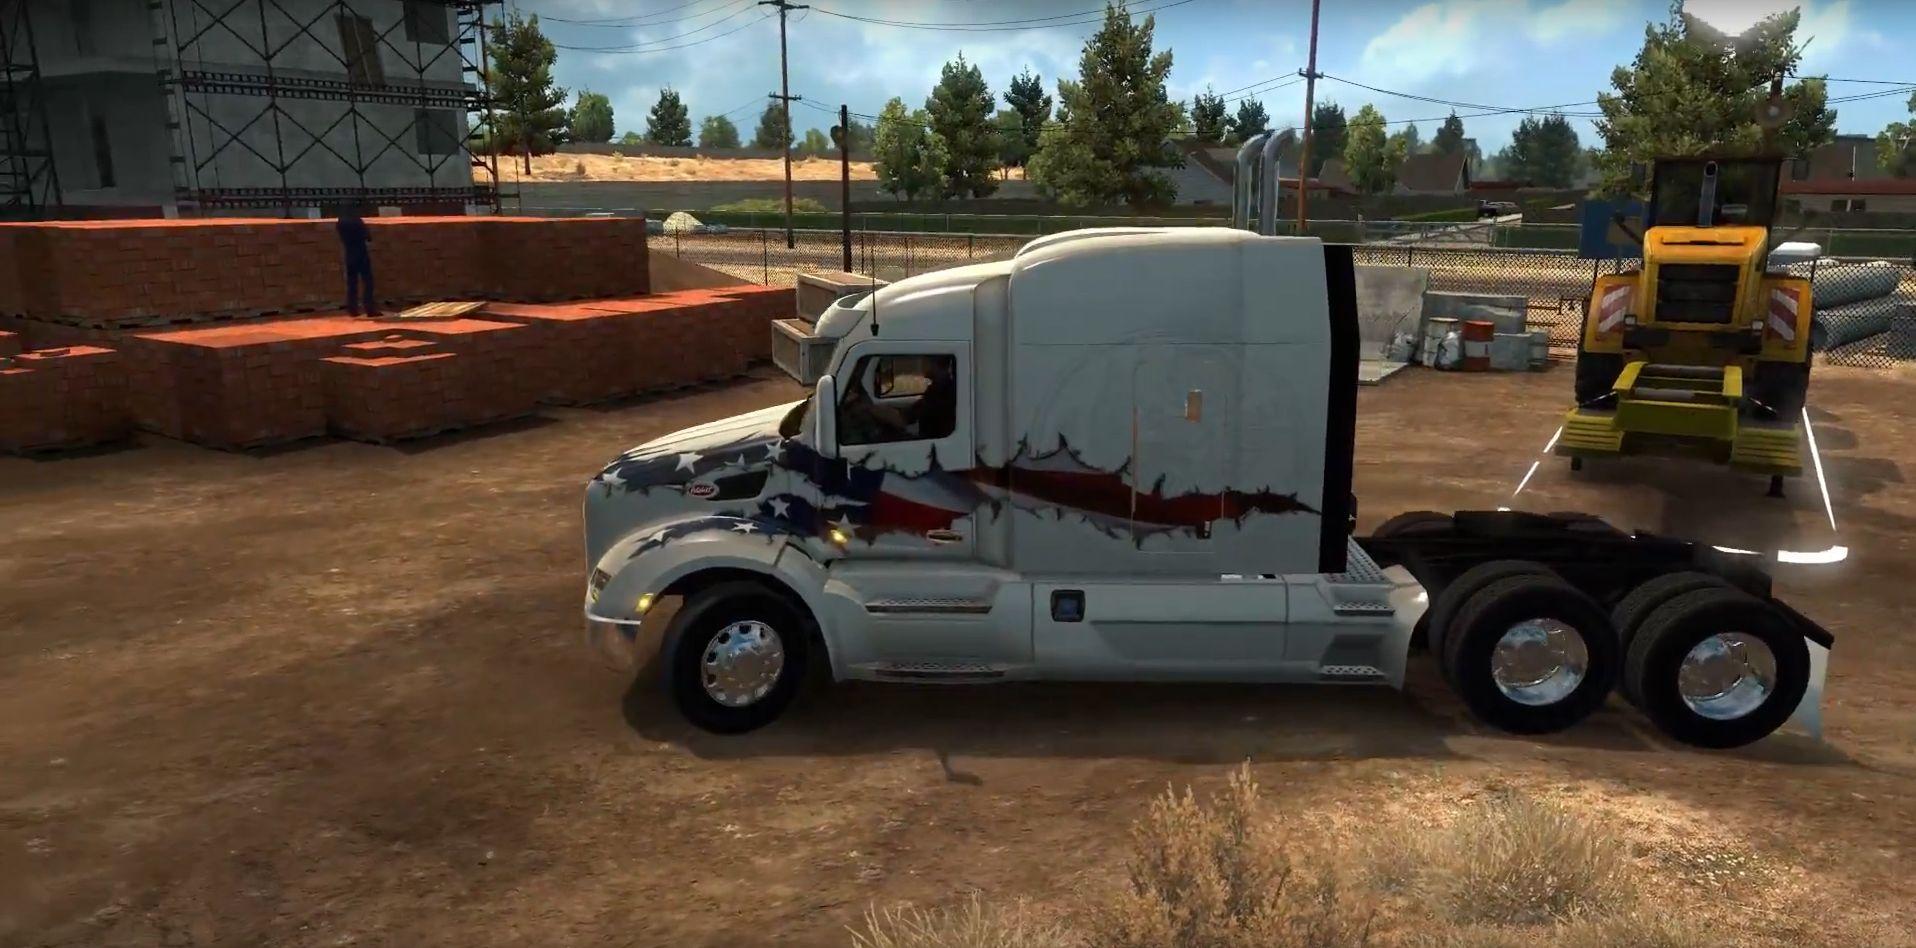 American Truck Simulator: Дневники дальнобойщика от Squirrel